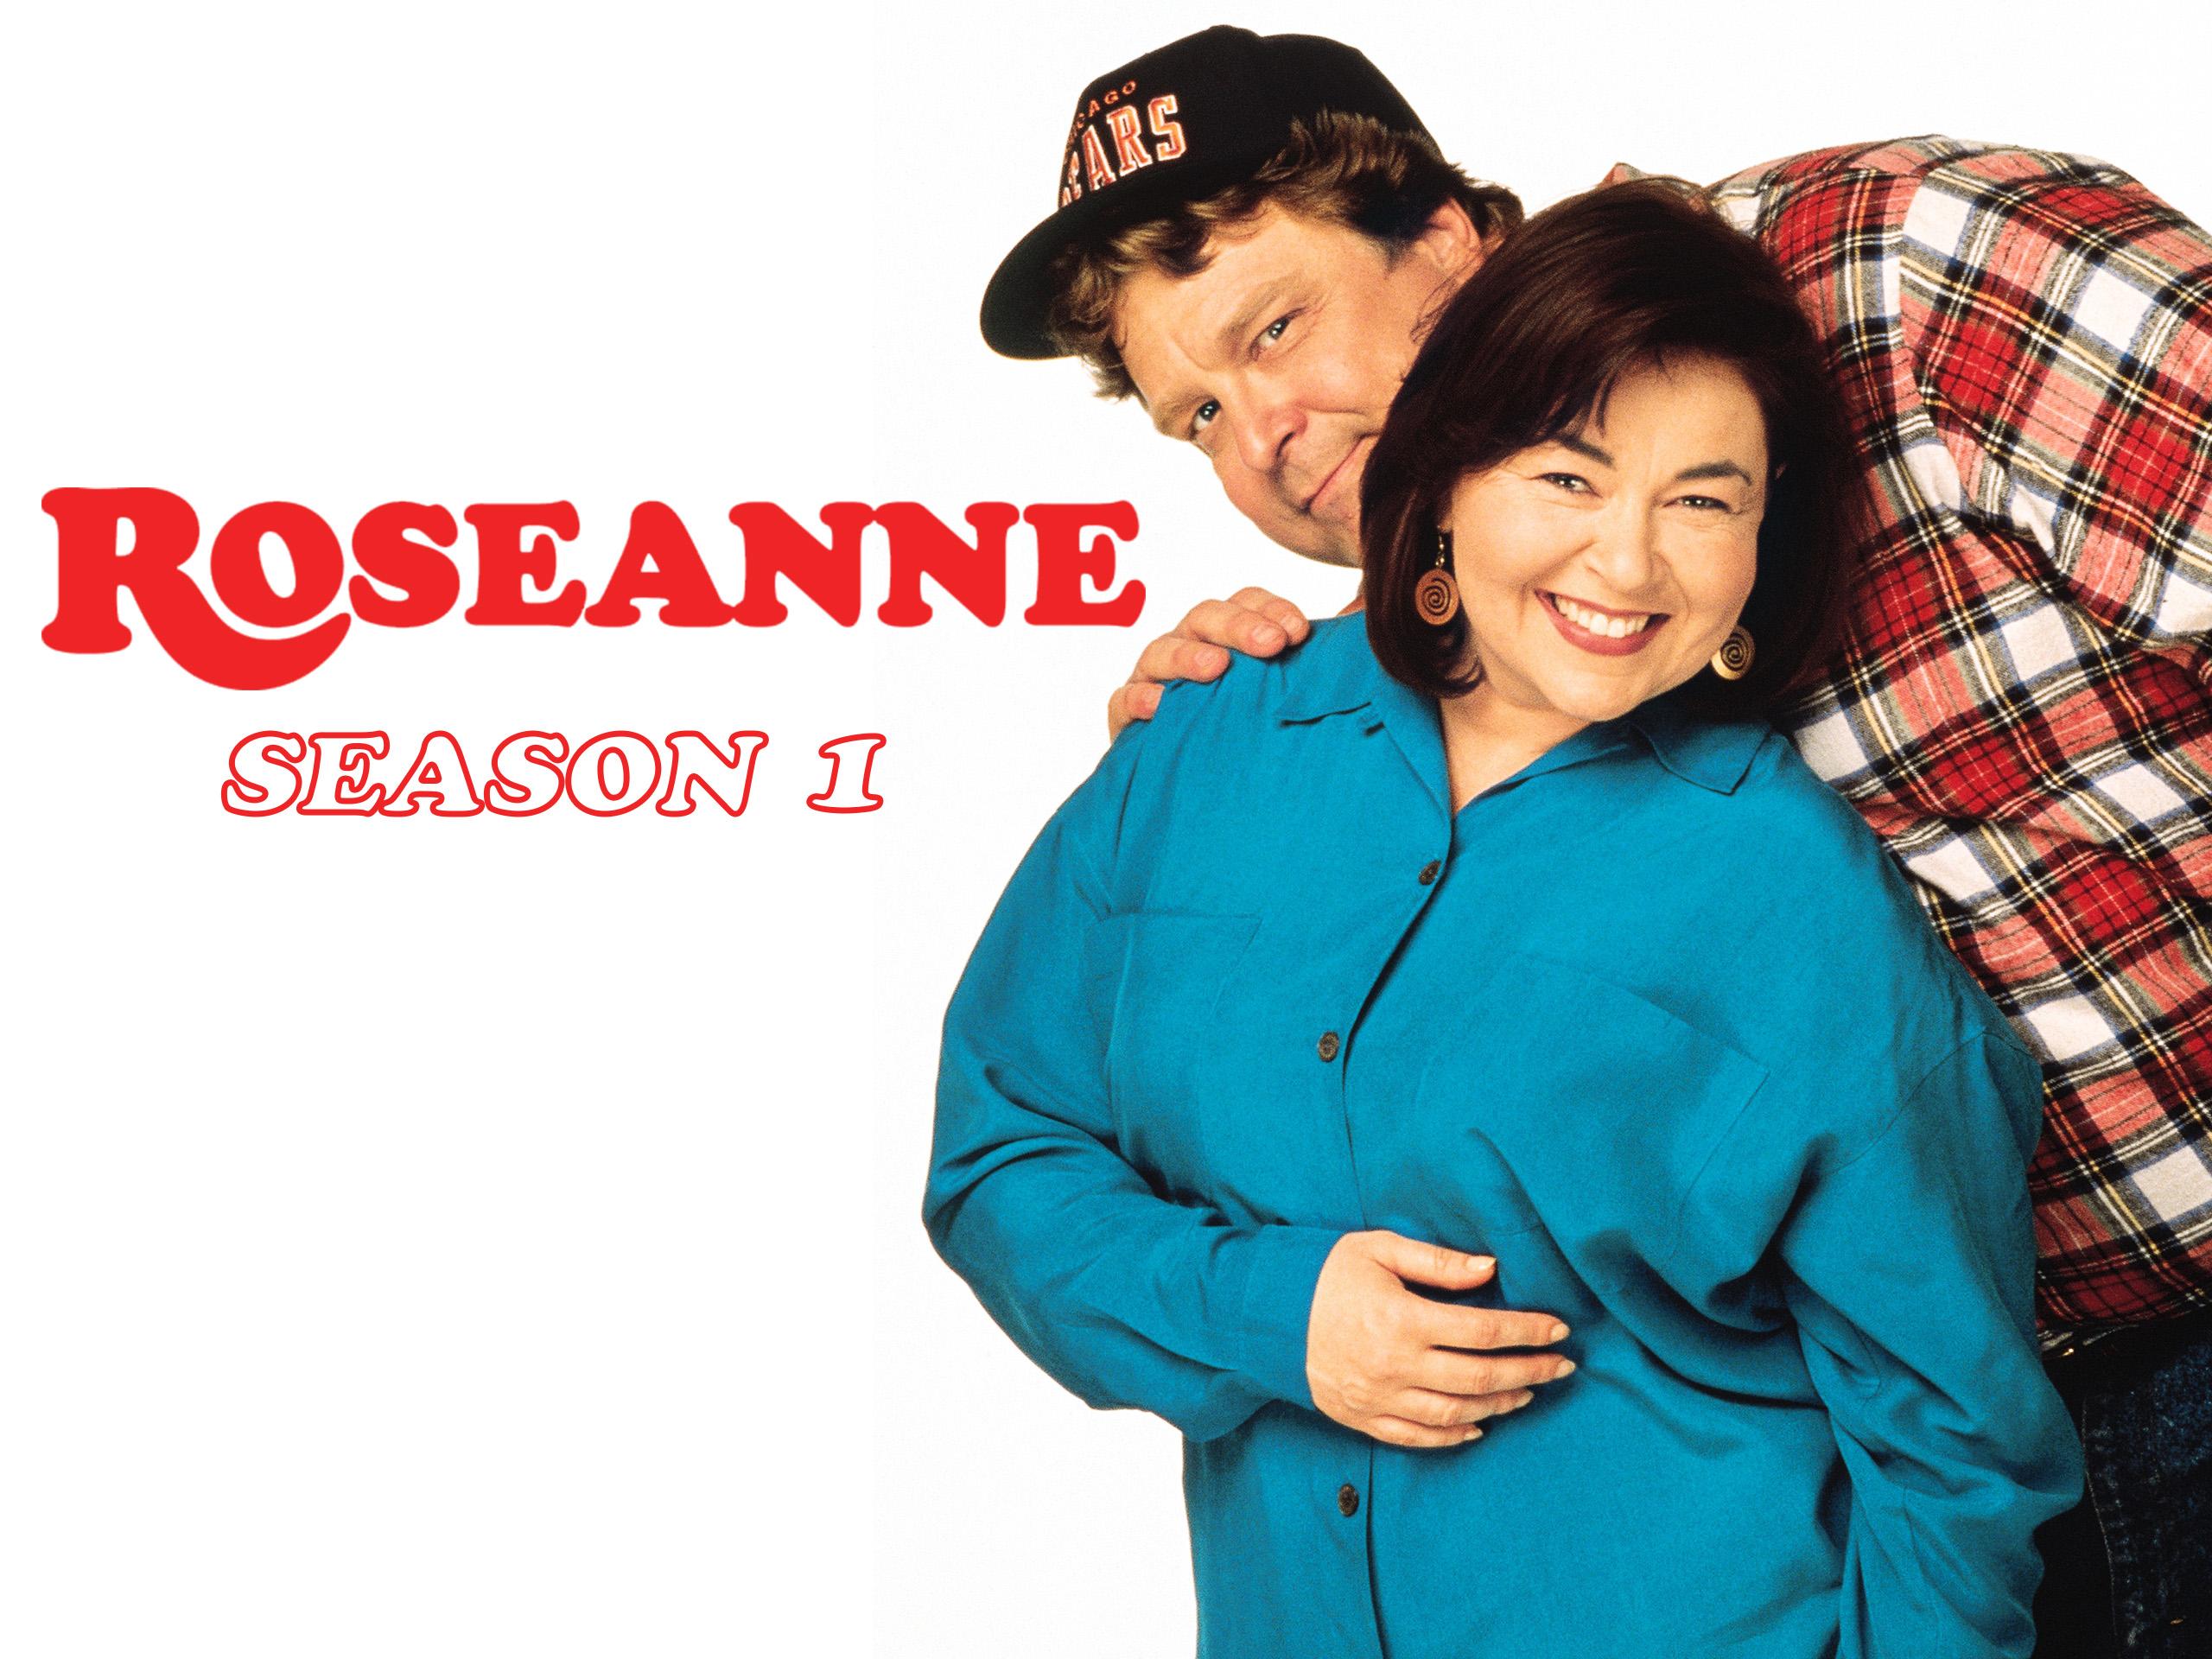 Watch Roseanne Episodes on ABC | Season 1 (1989) | TV Guide